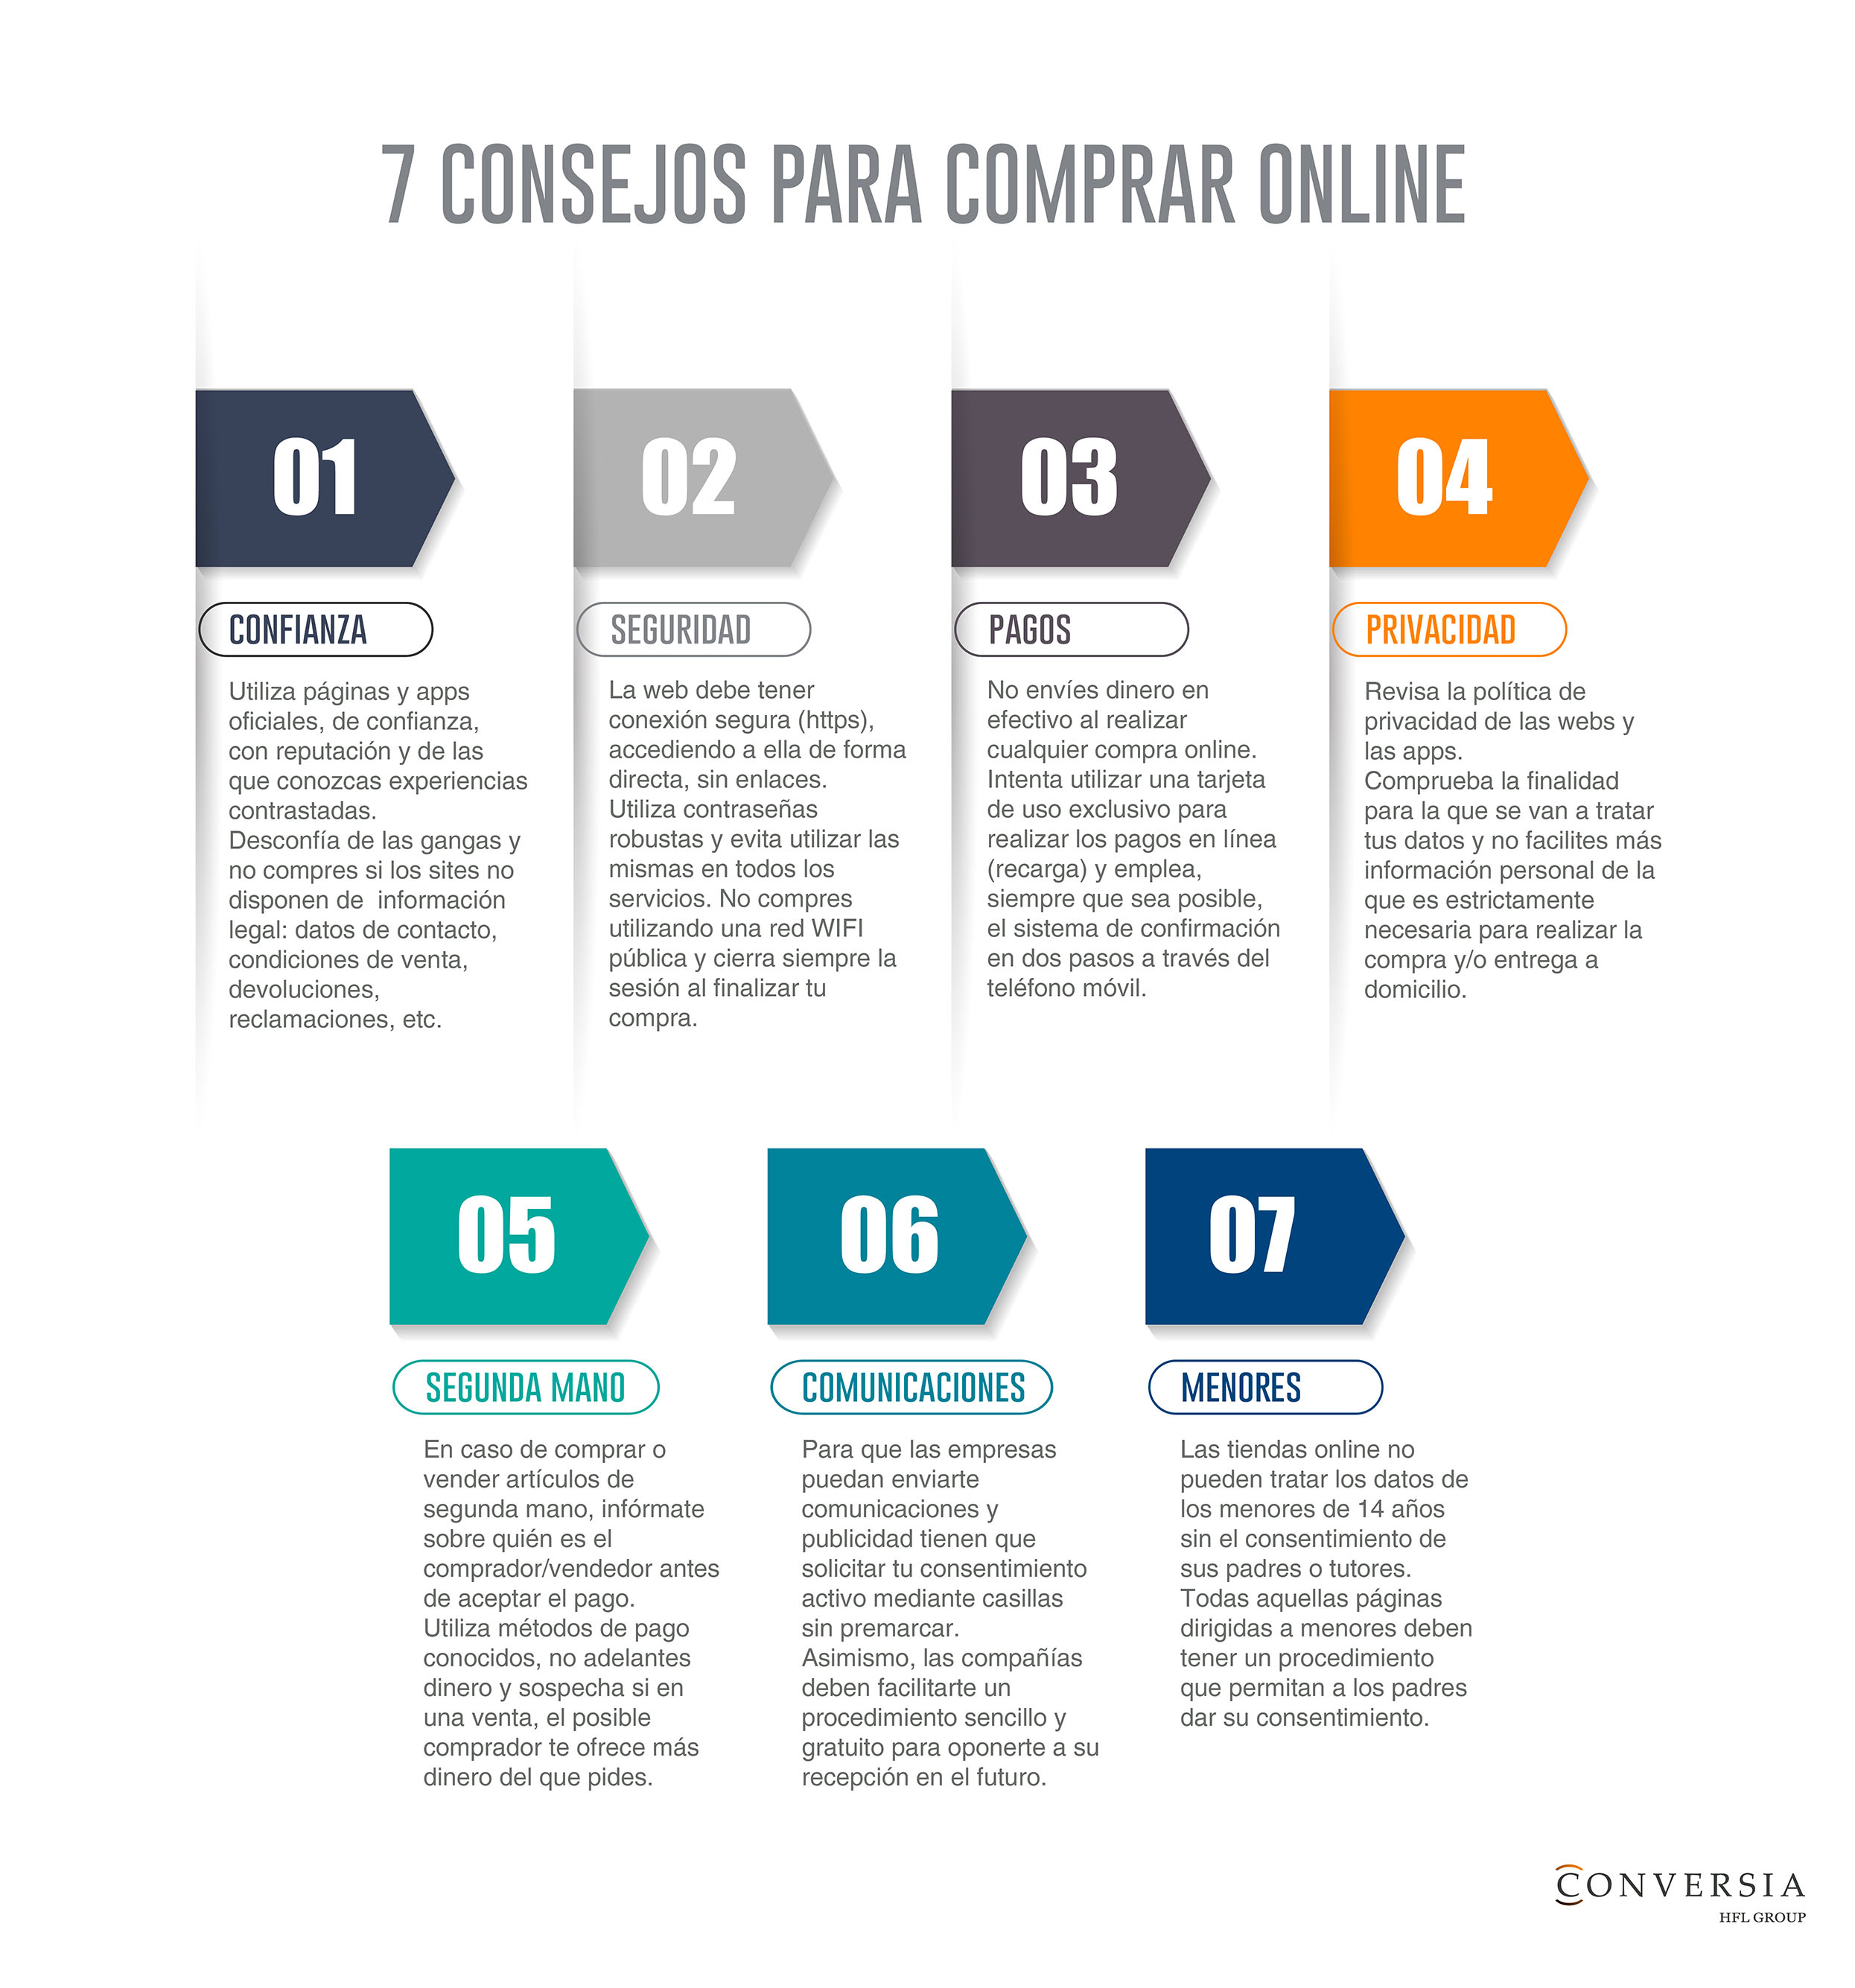 Infografia-Conversia-Black-Friday-Consejos-comprar-online